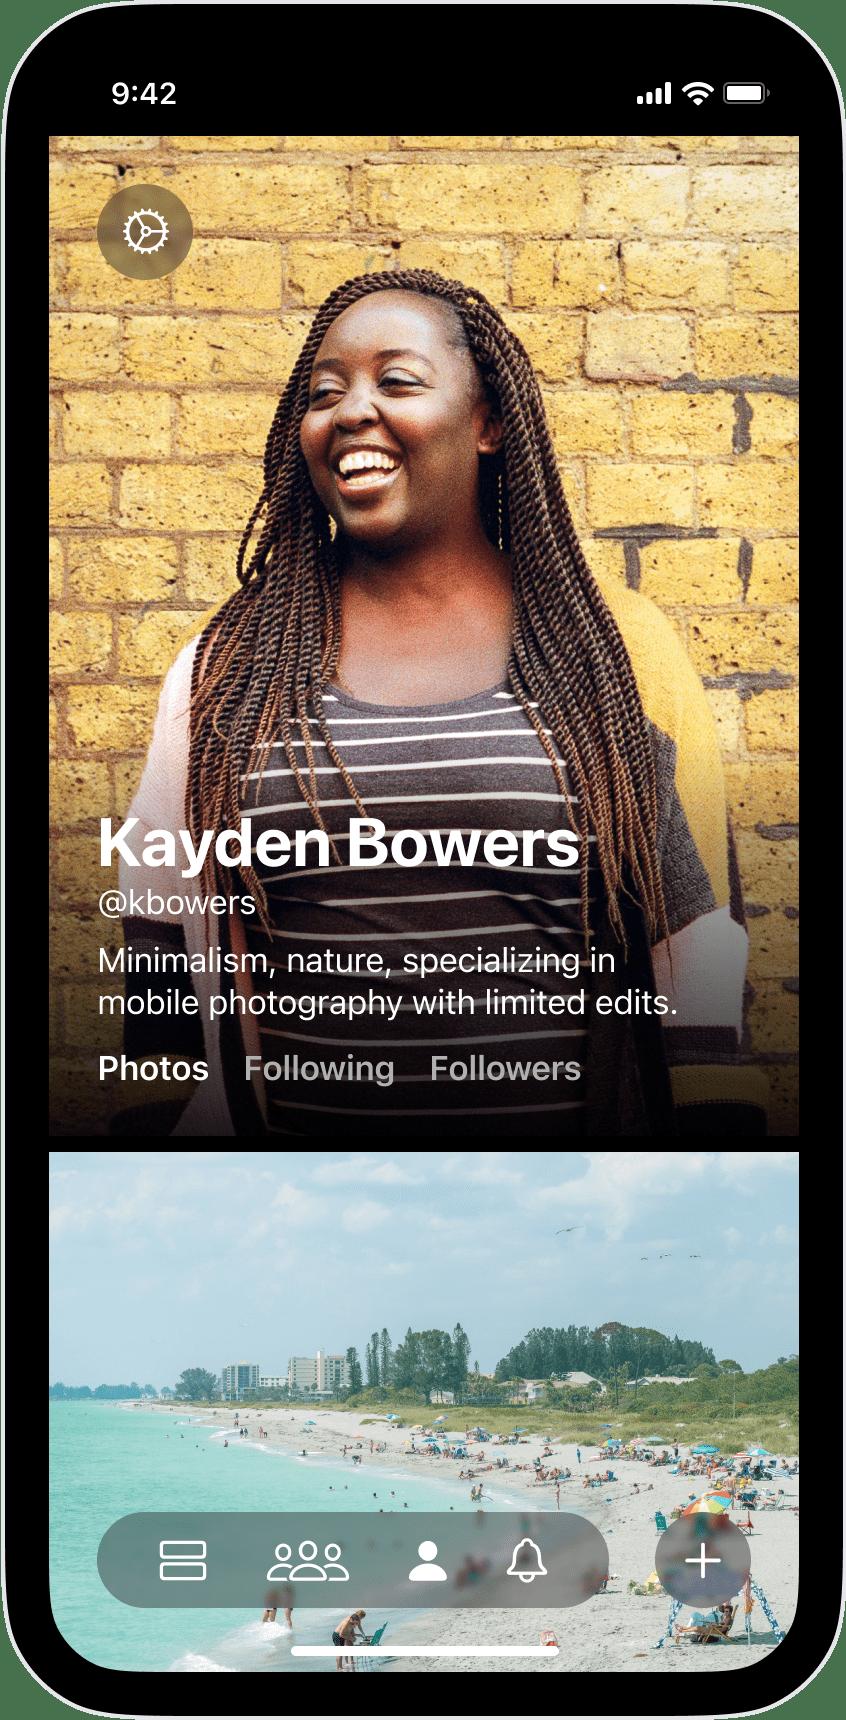 iPhone profile image